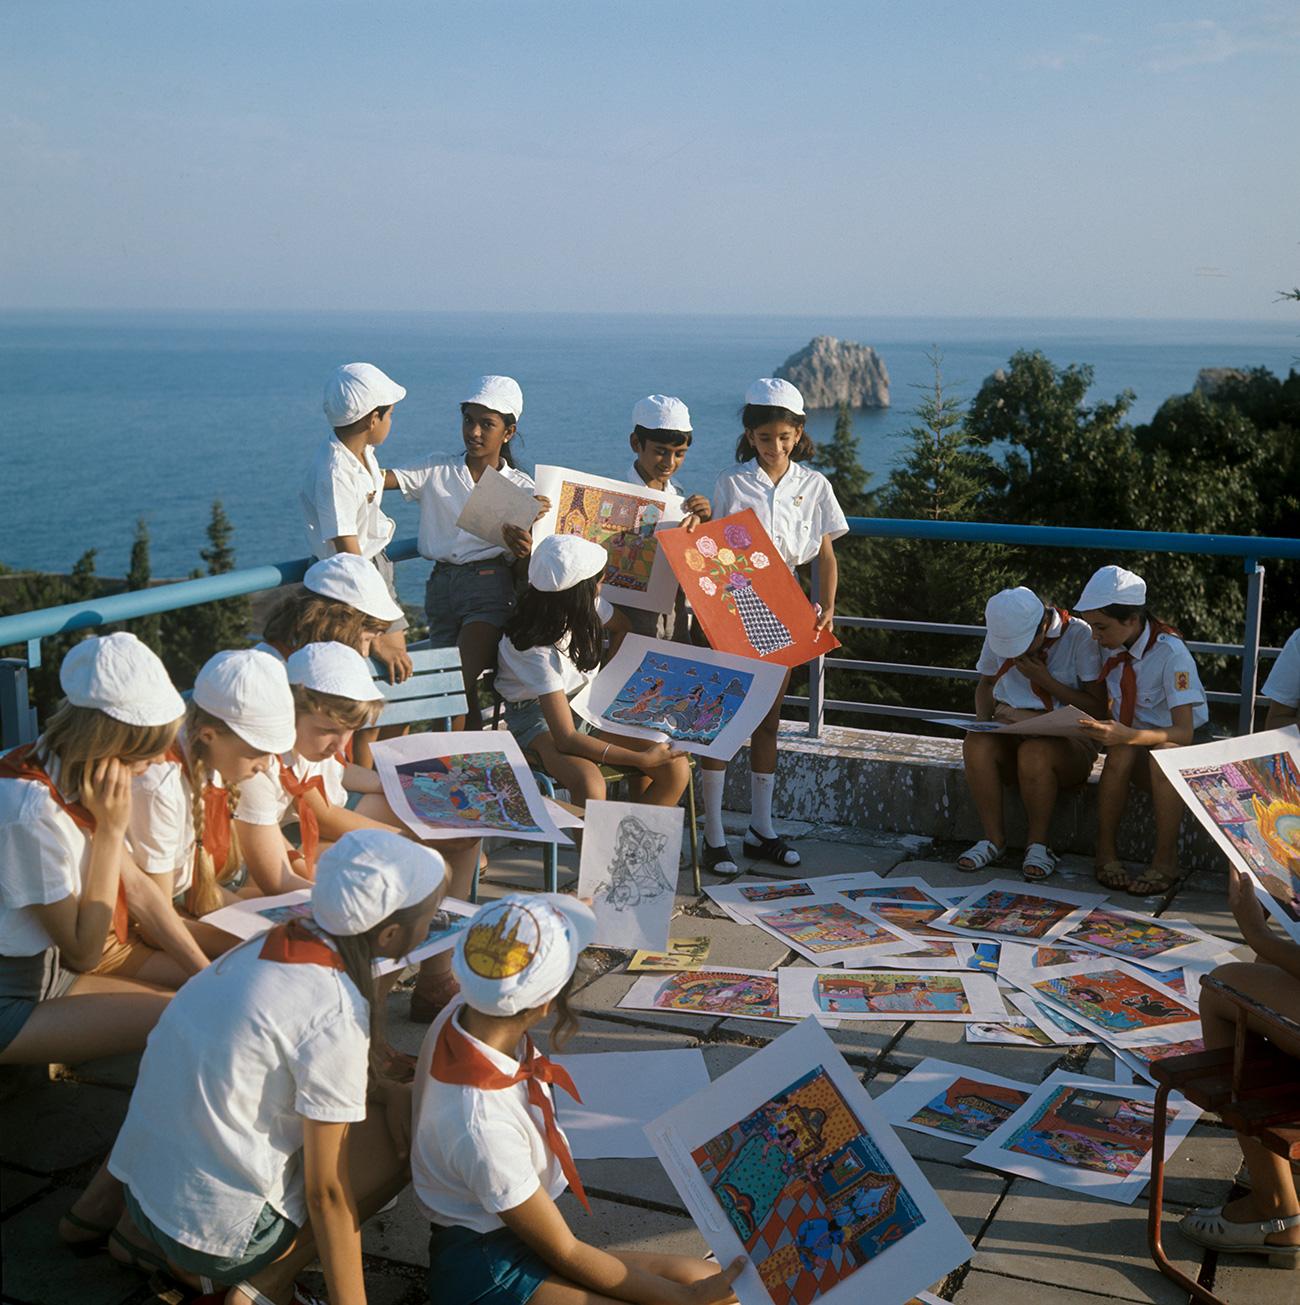 "For schoolchildren, having Pioneer status was a matter of immense pride. Photo: The All-Union Pioneer Camp ""Artek"" in Crimea. Young painters preparing for an arts festival.1975. Source: Runov/RIA Novosti"